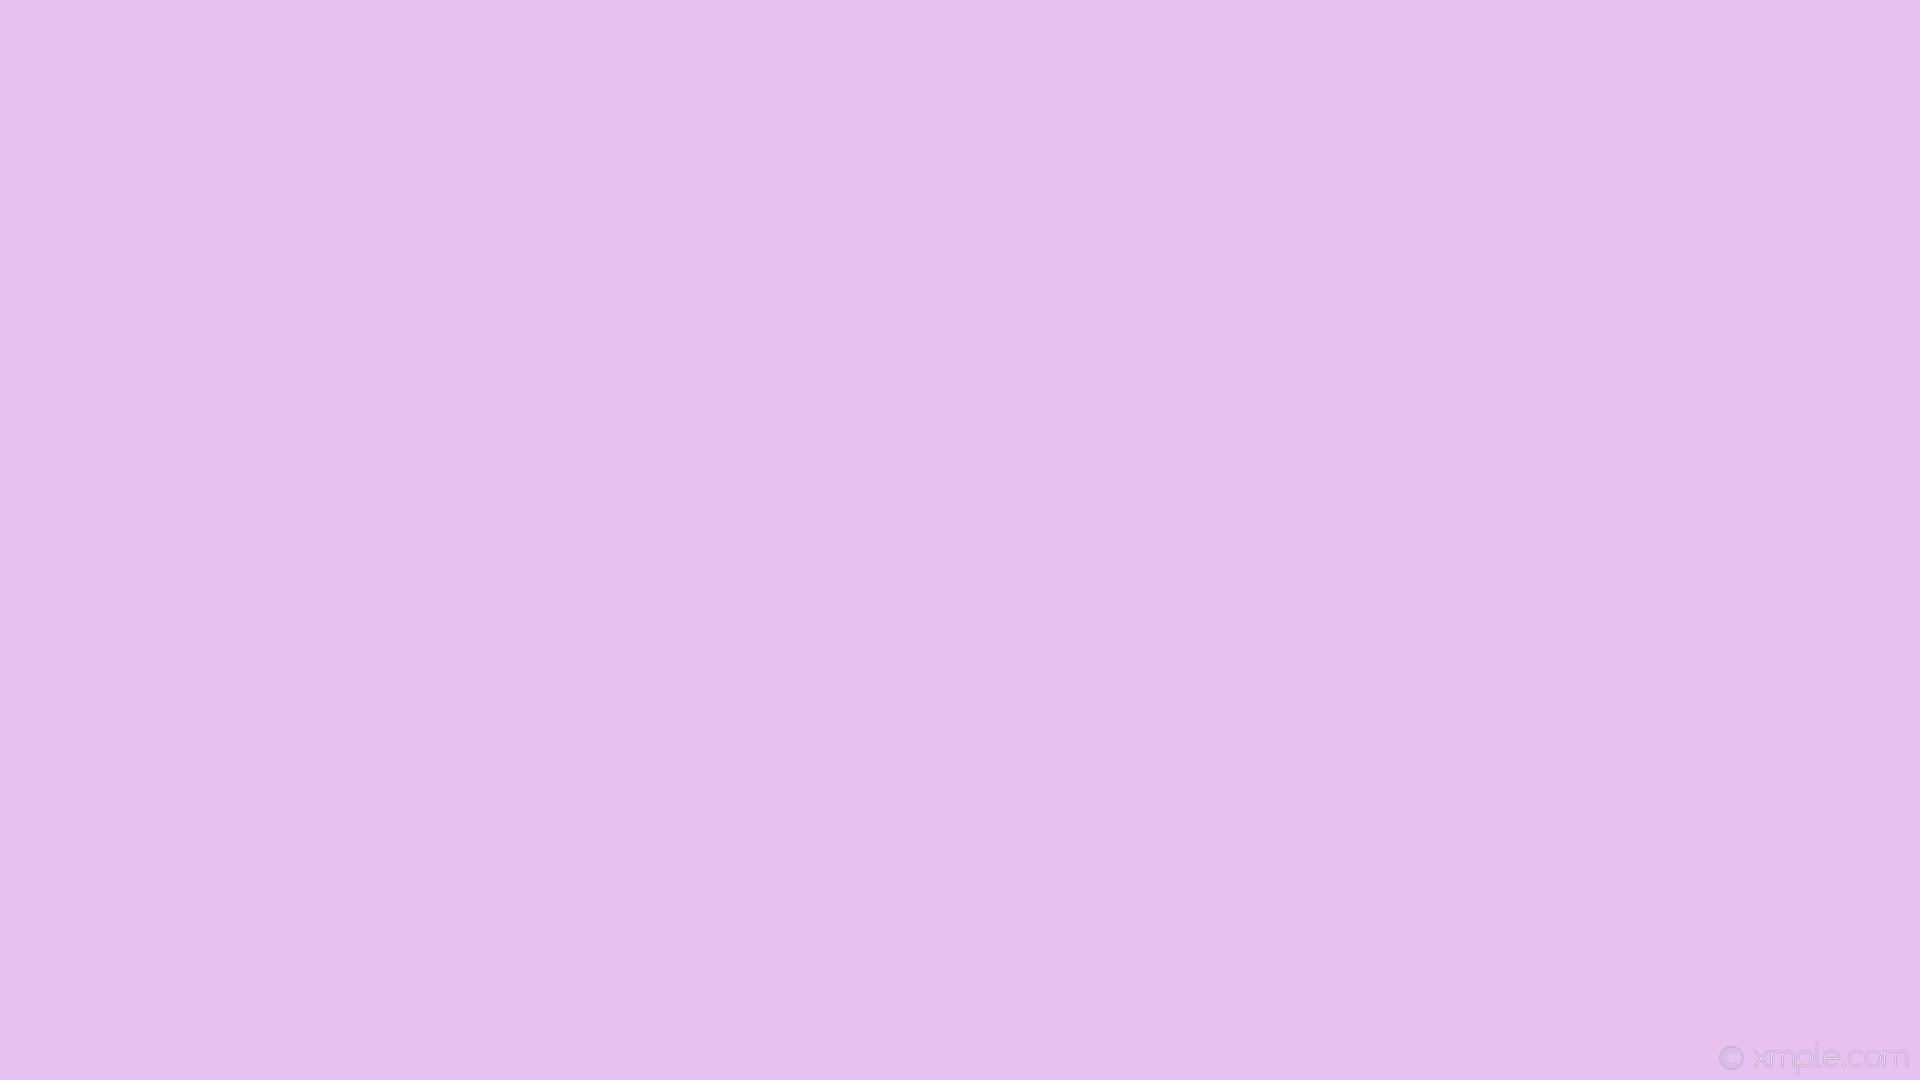 wallpaper single magenta solid color one colour plain light magenta #e7c1f0